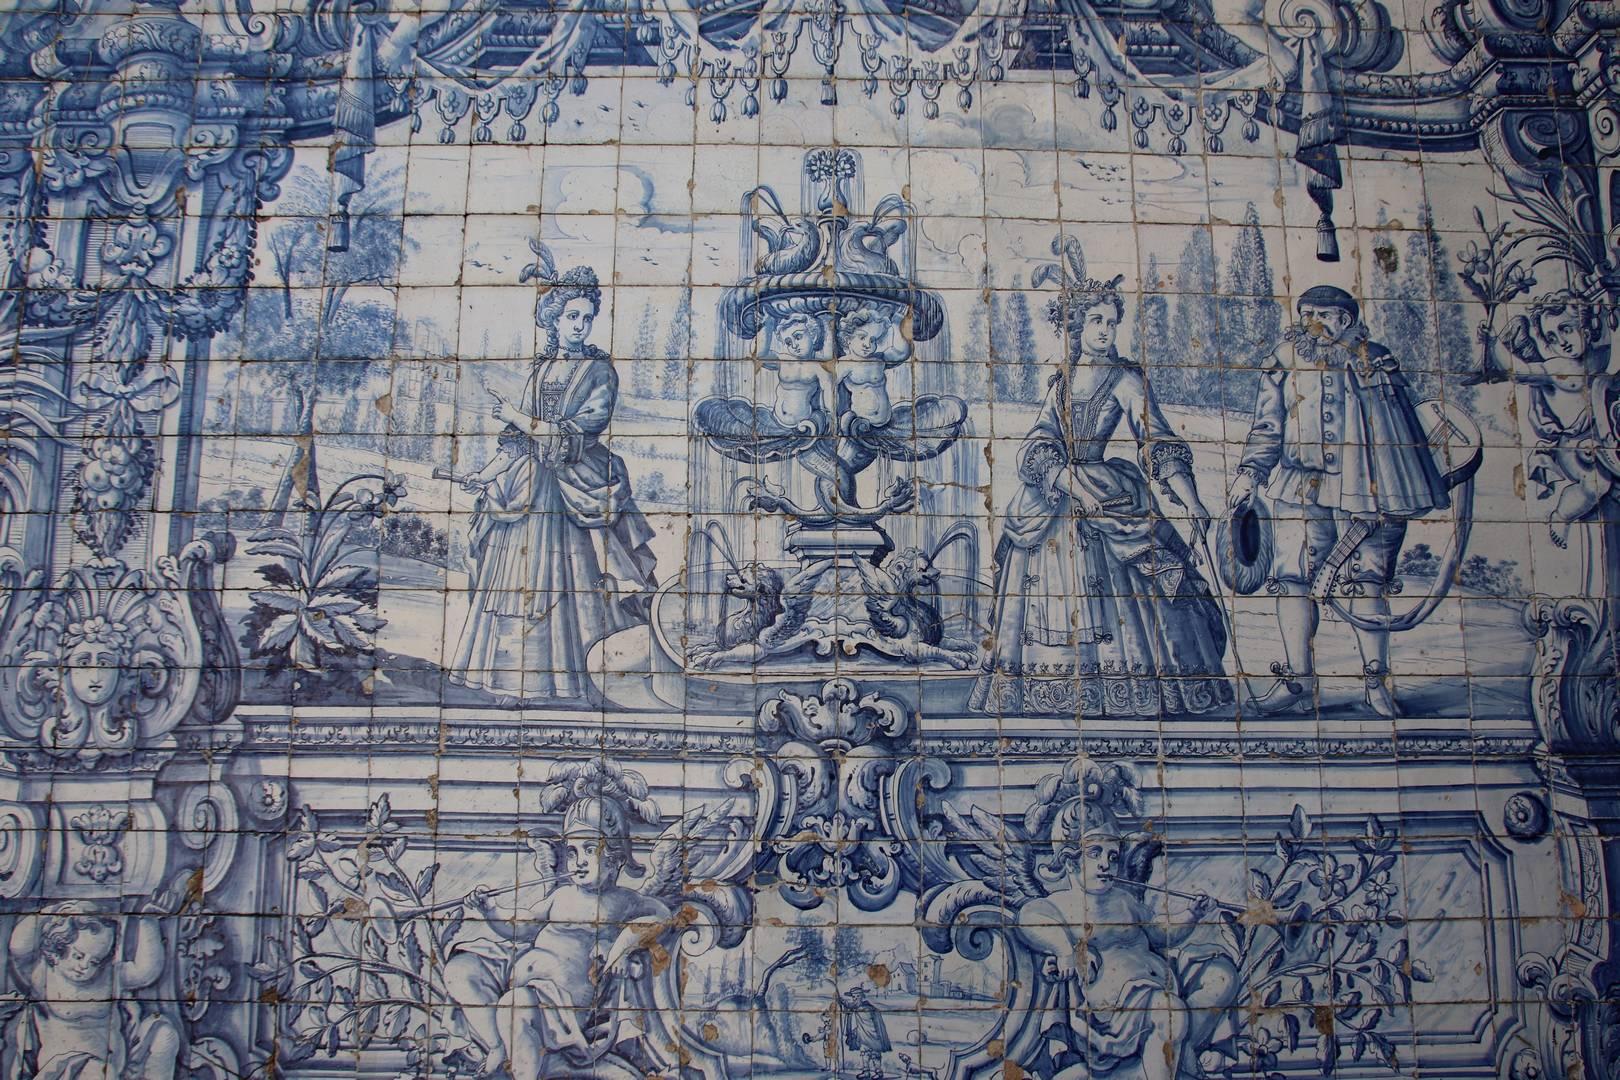 Portugal - Azulejos au claustro à Porto